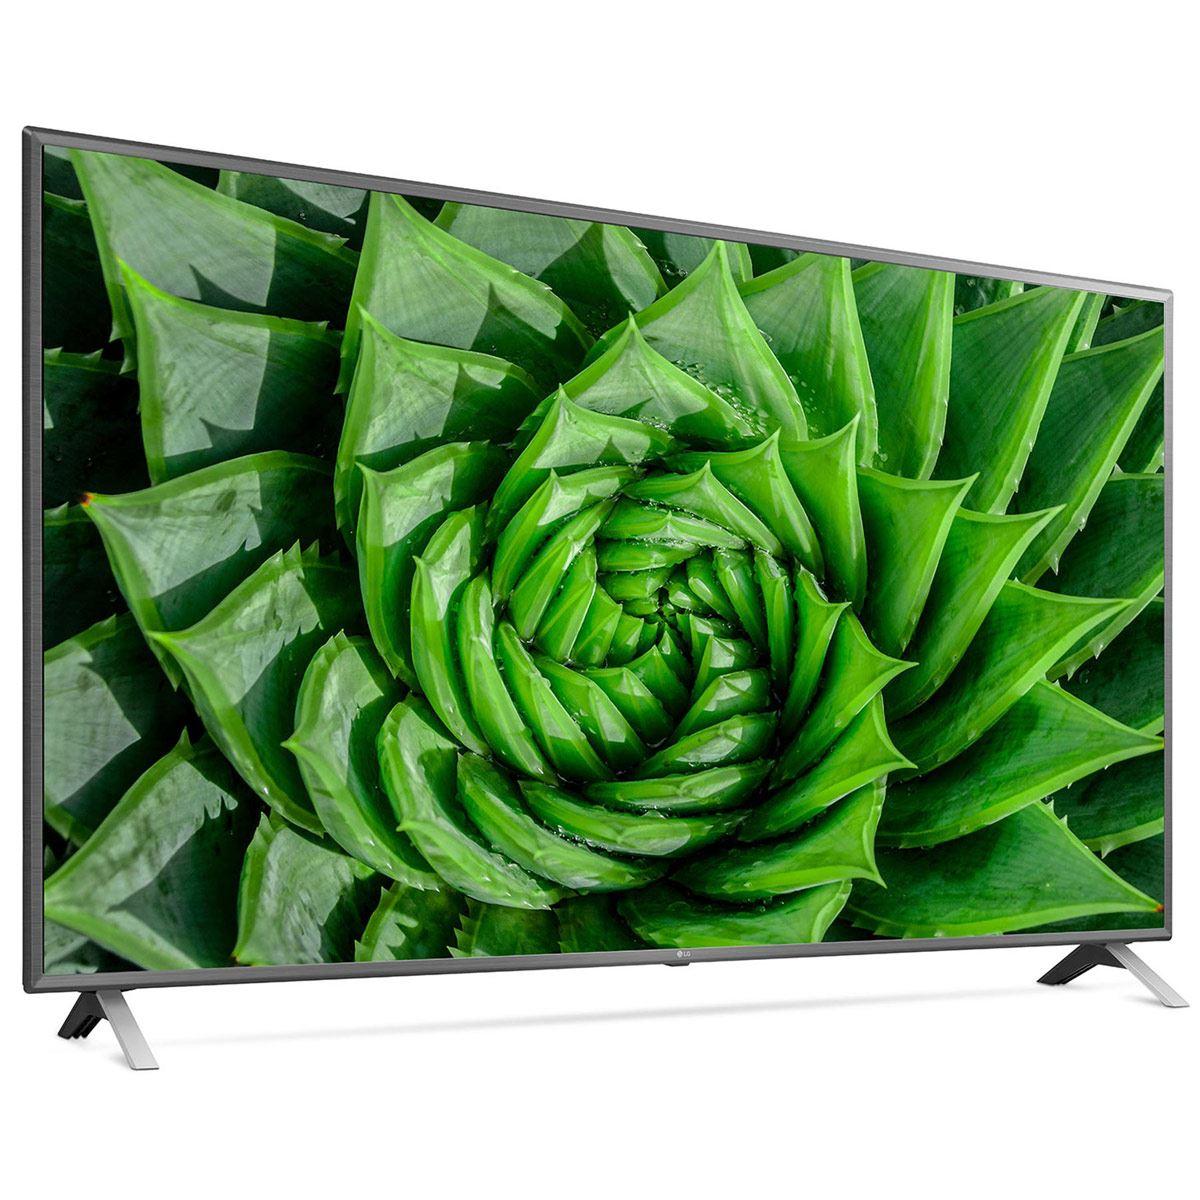 "Pantalla LG UHD TV AI ThinQ 4K 75"" 75UN8000PUB"